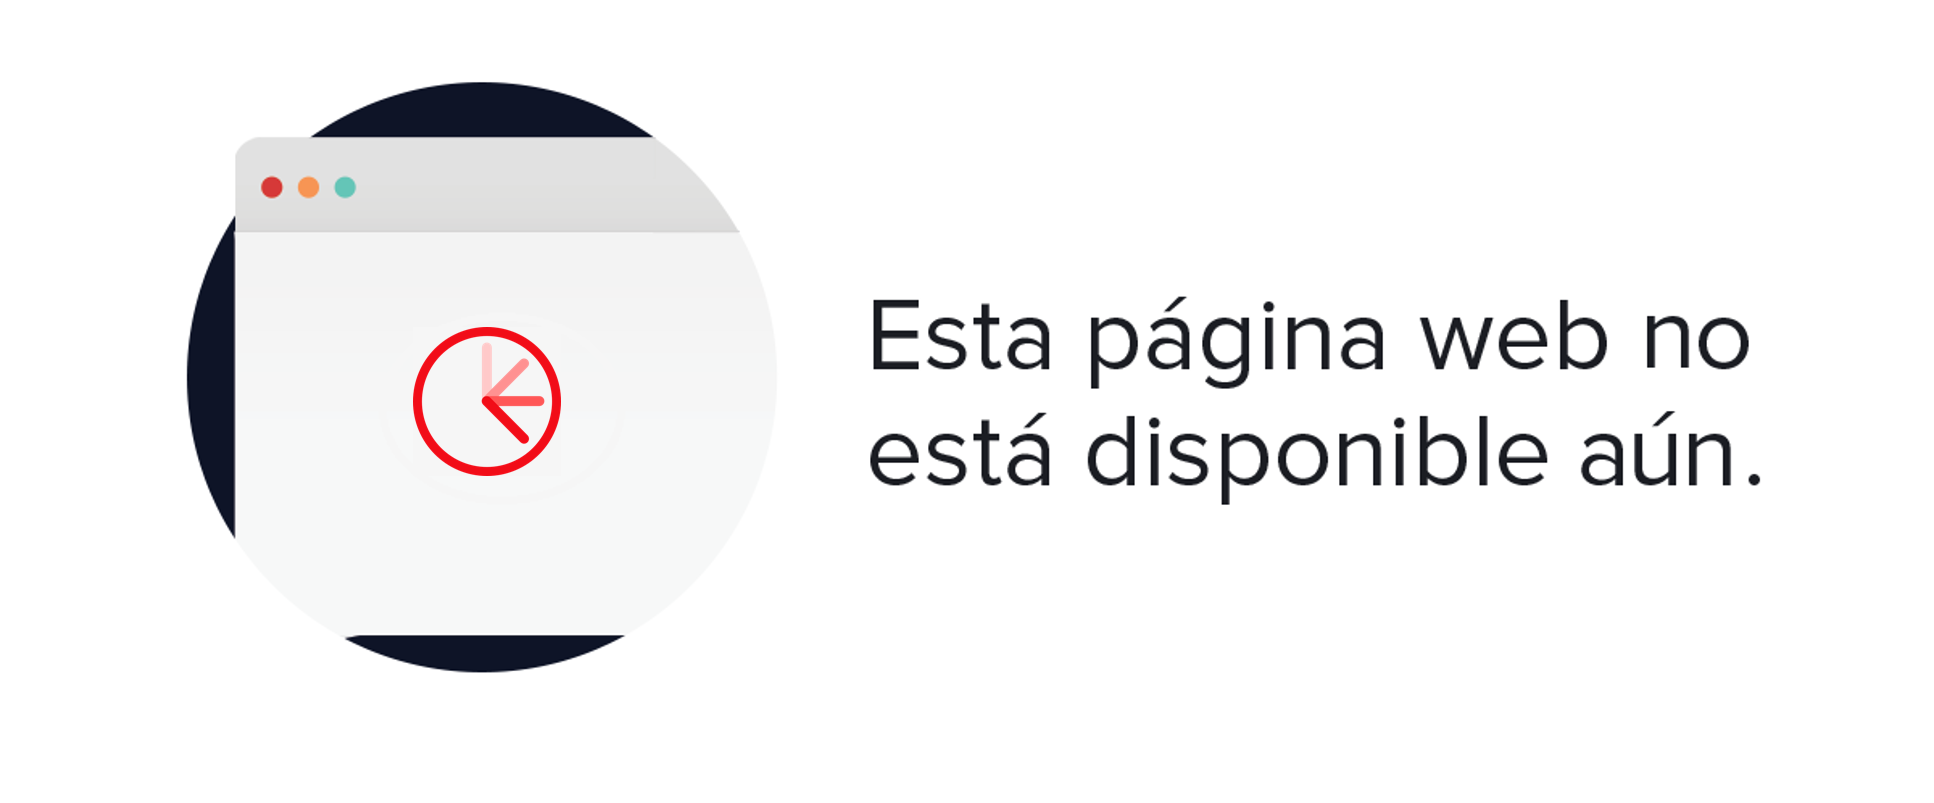 Bolsas de Papel Personalizadas con Asa Rizada Medidas 36+12x36 cm 110gr